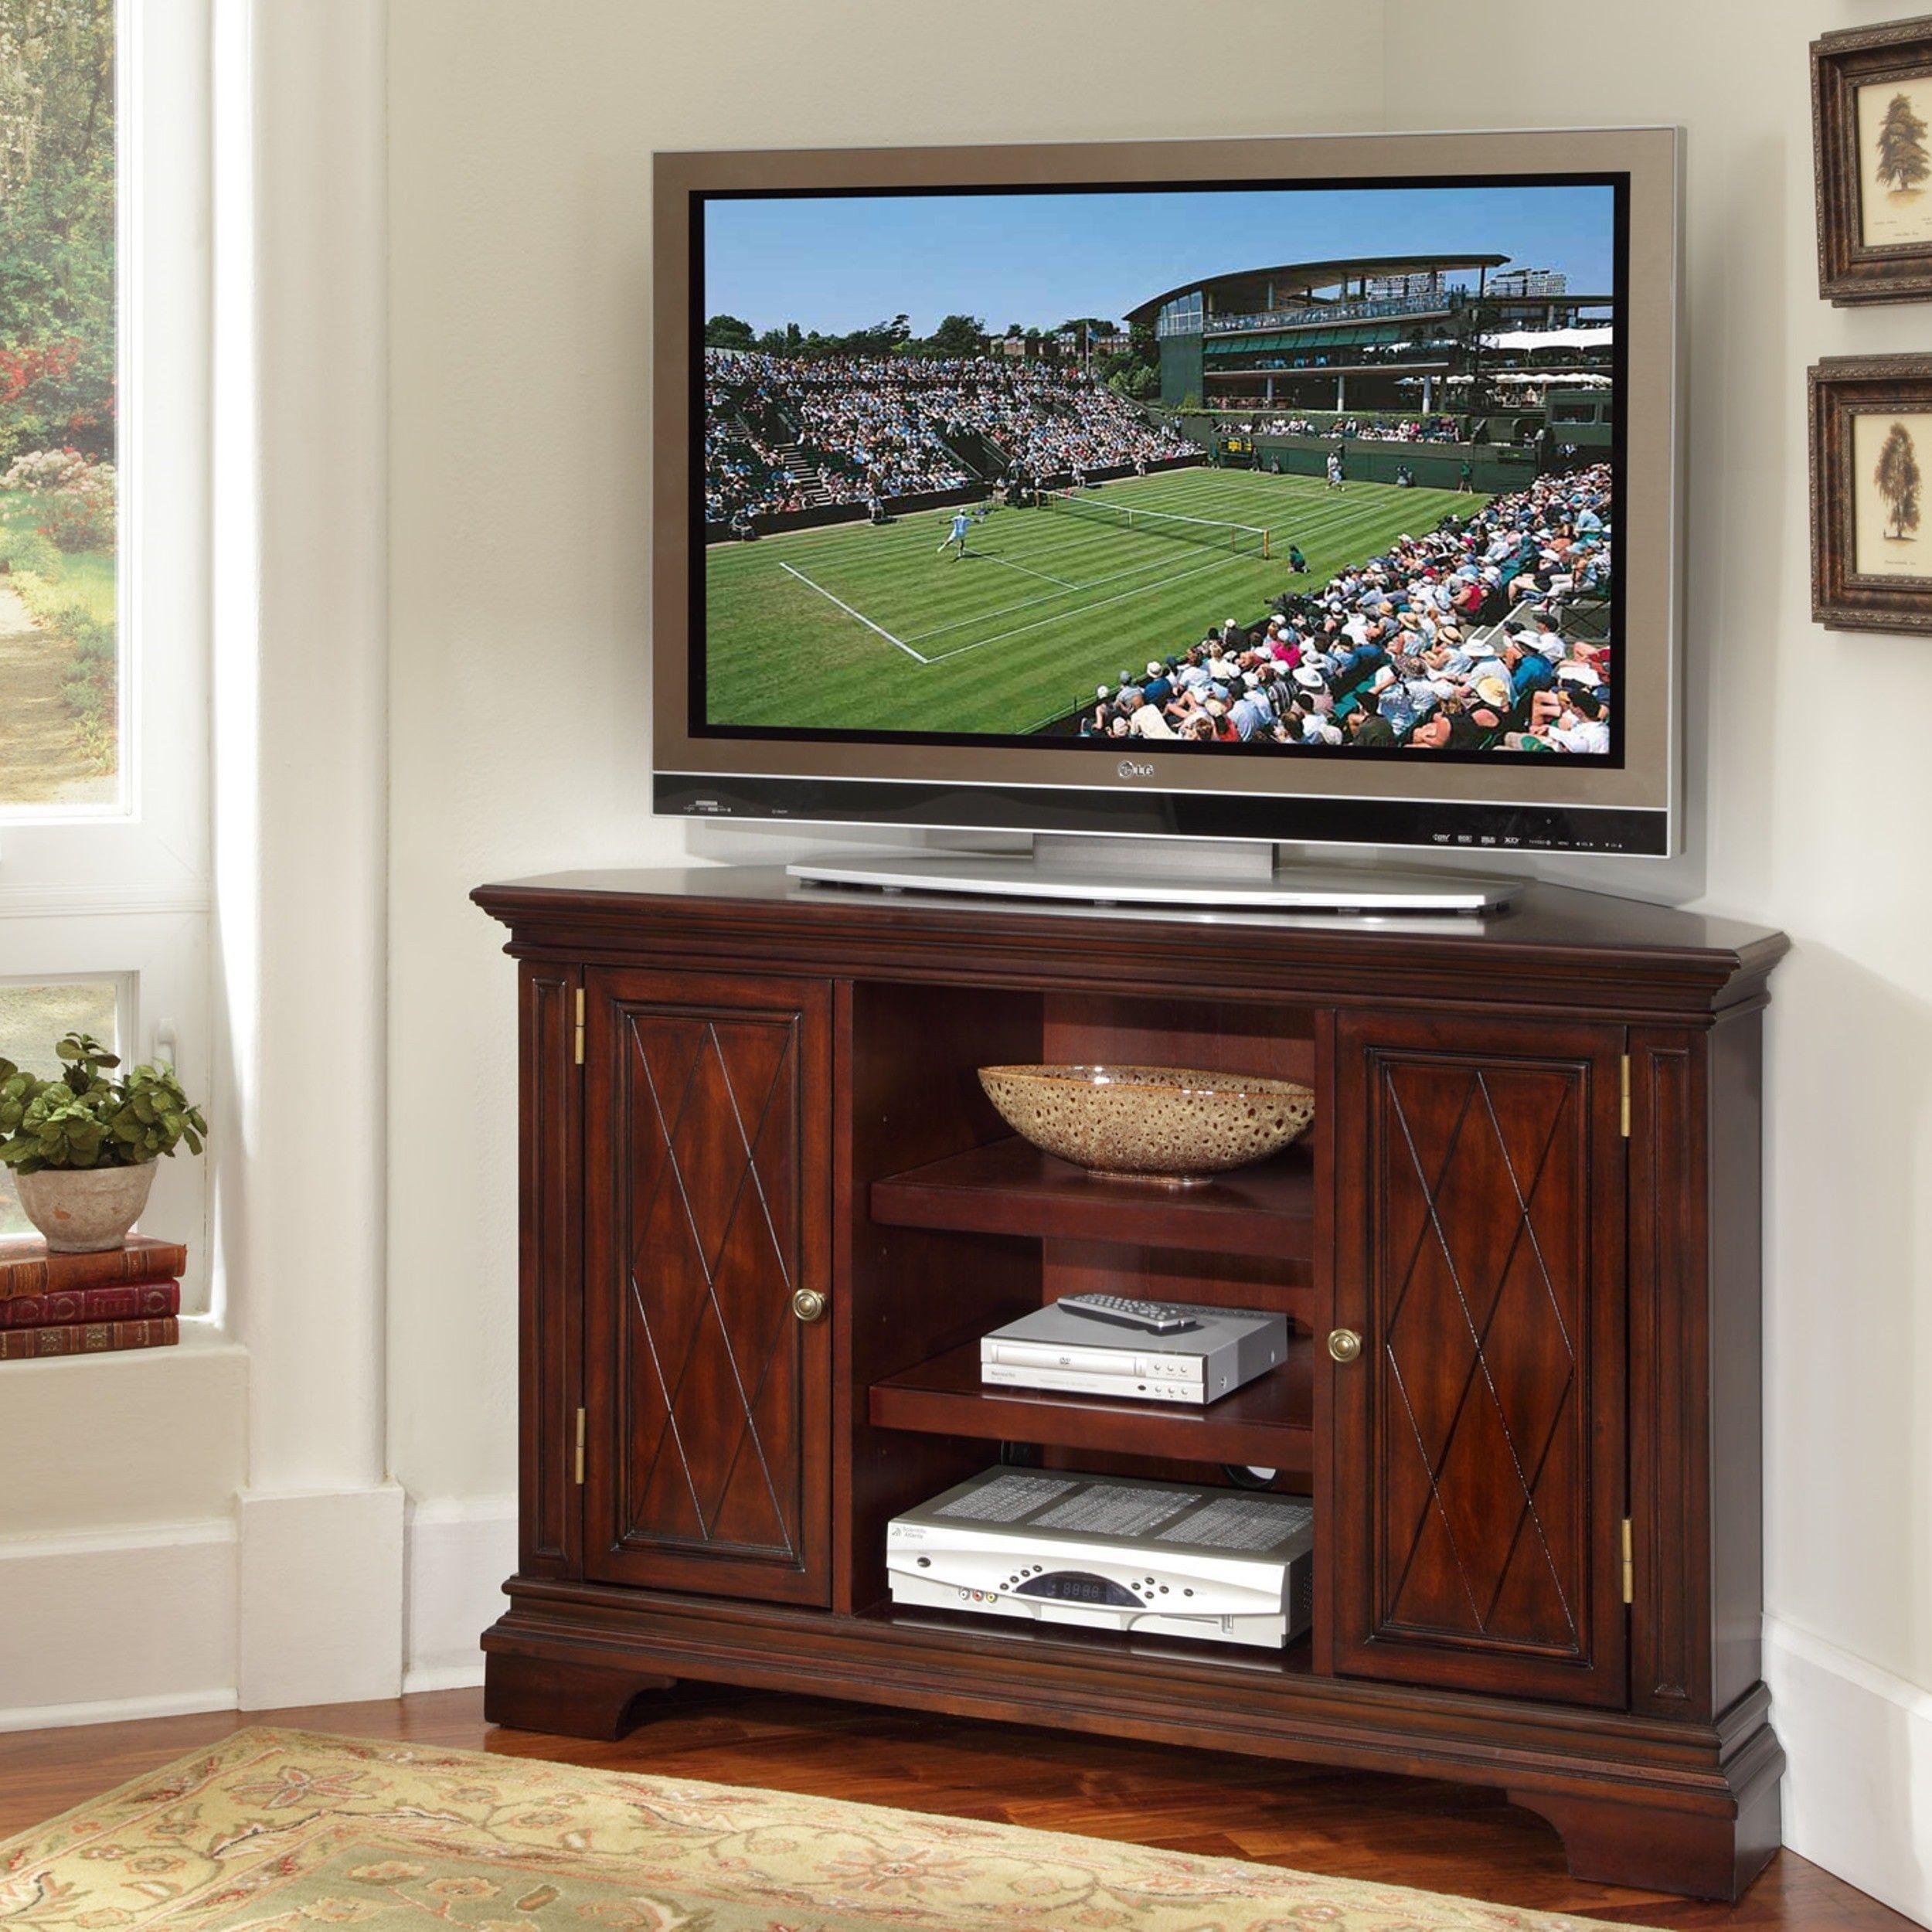 Muskoka alpine 62 in wide electric fireplace tv stand burnished - Furniture Corner Dark Varnished Cherry Wood Tv Cabinet